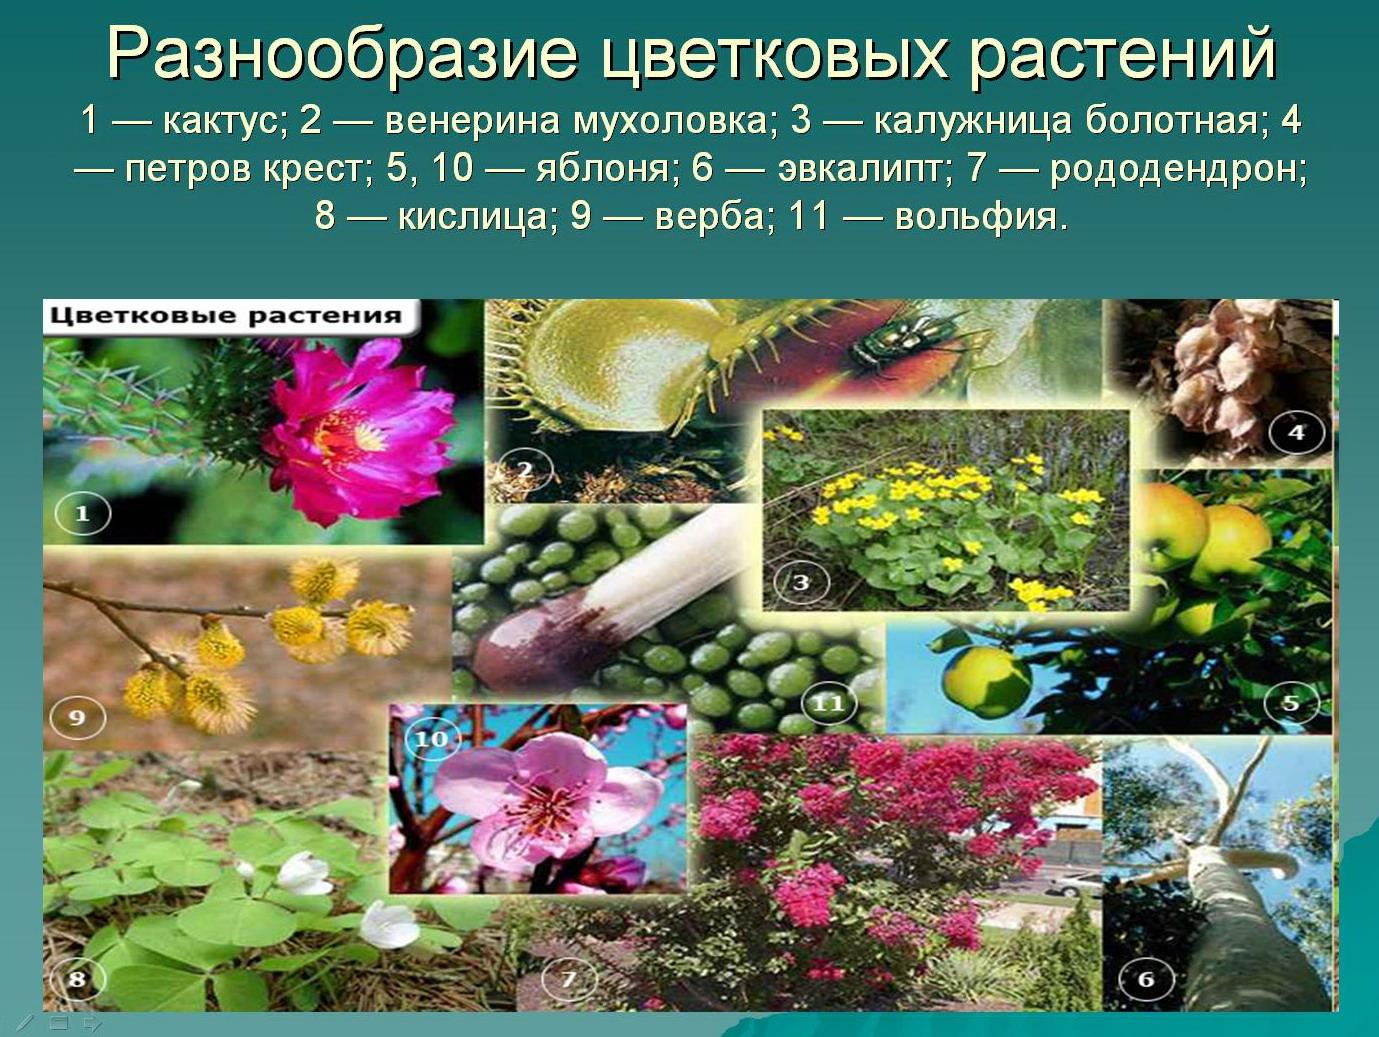 hello_html_20100453.jpg